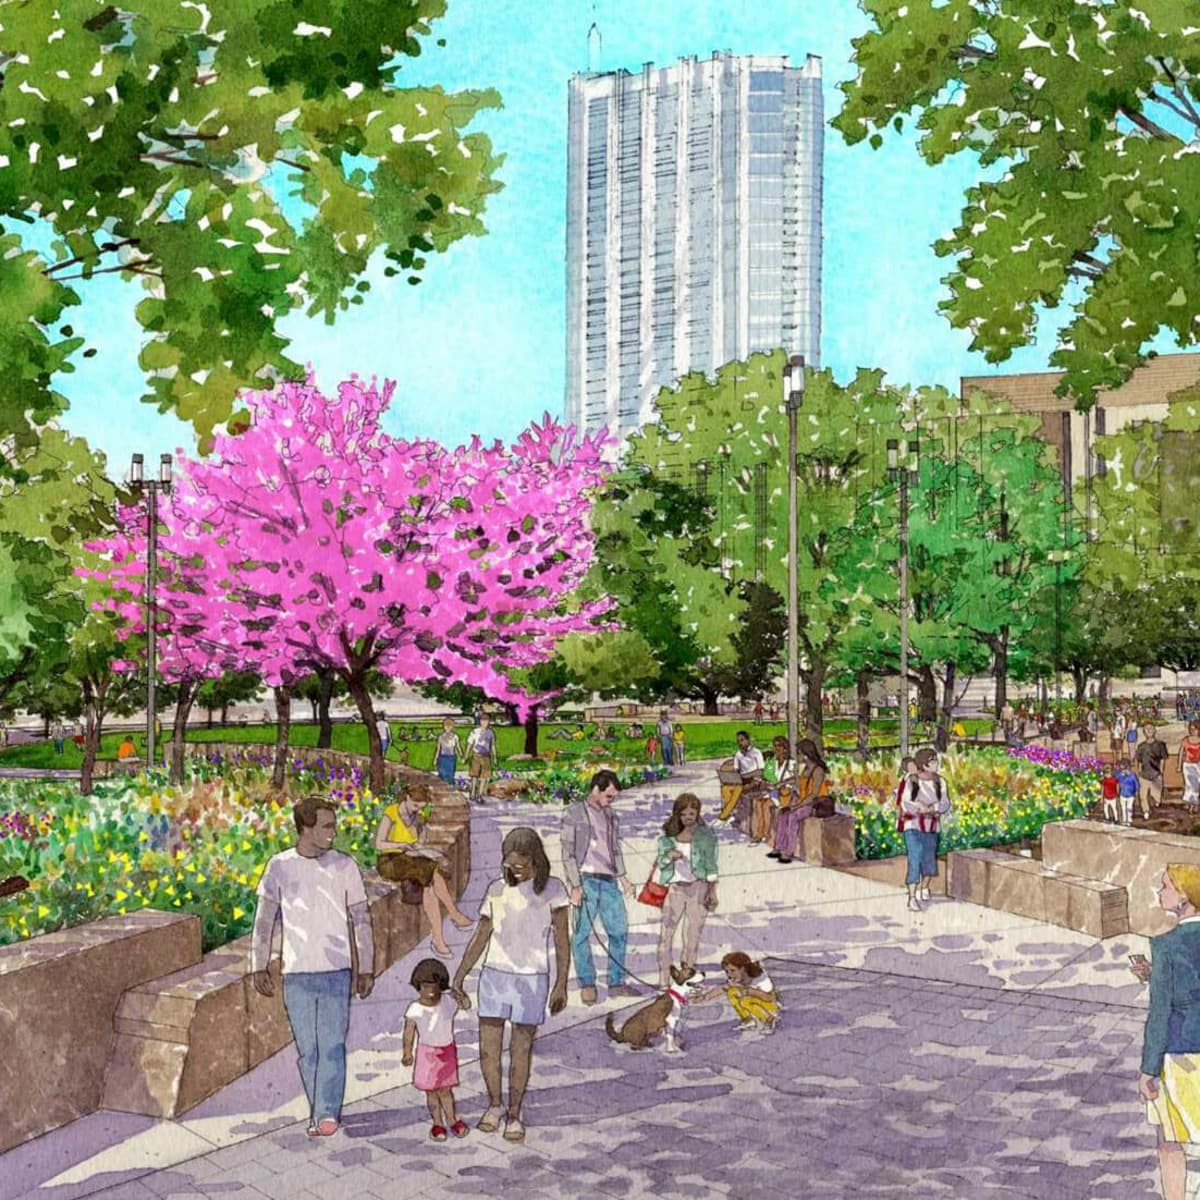 Republic Square Park downtown Austin renovation rendering 2016